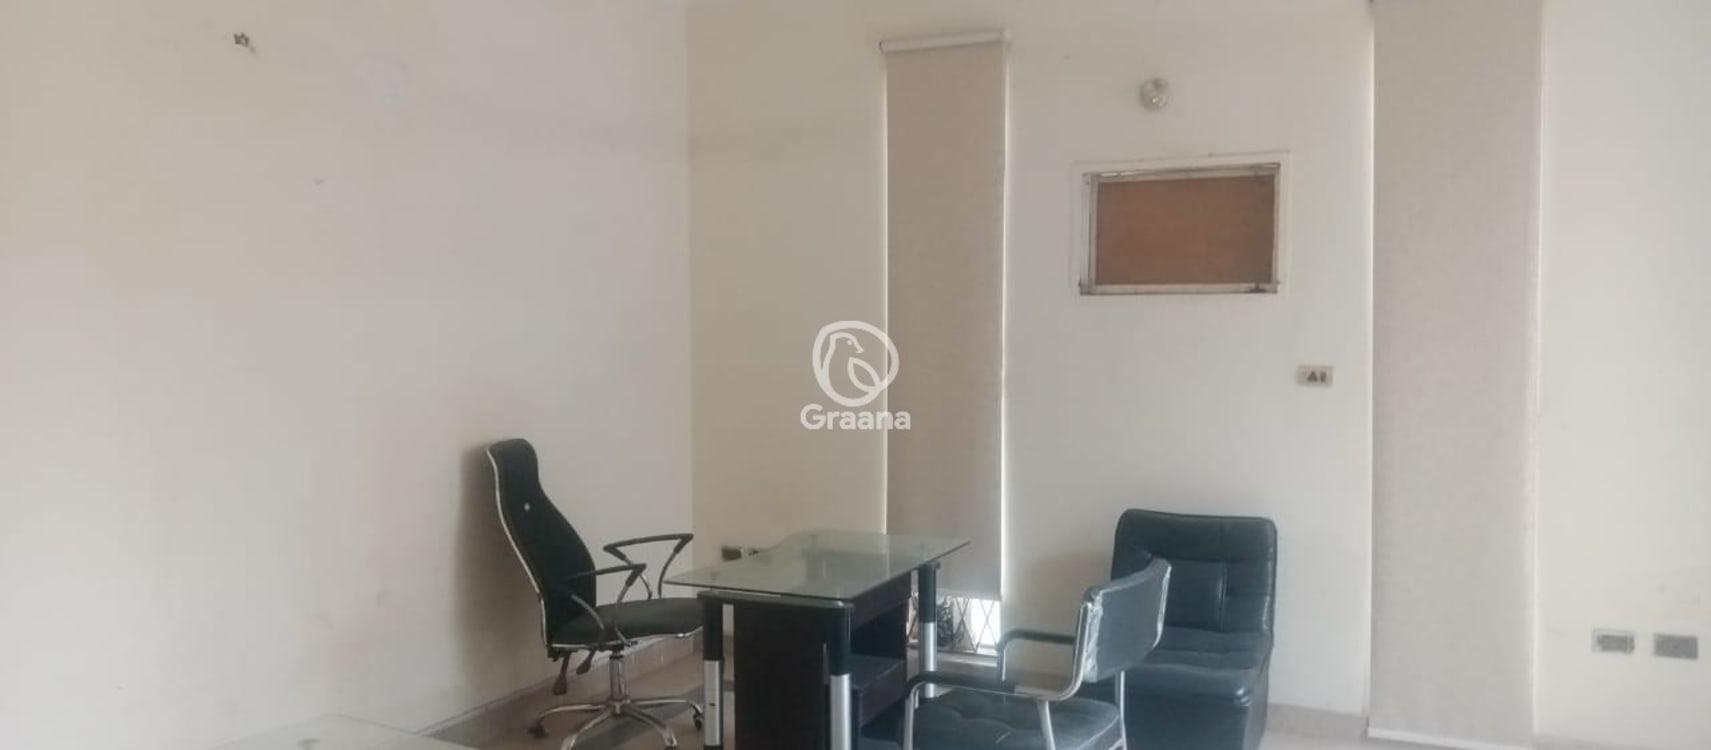 1 Kanal House For Rent   Graana.com